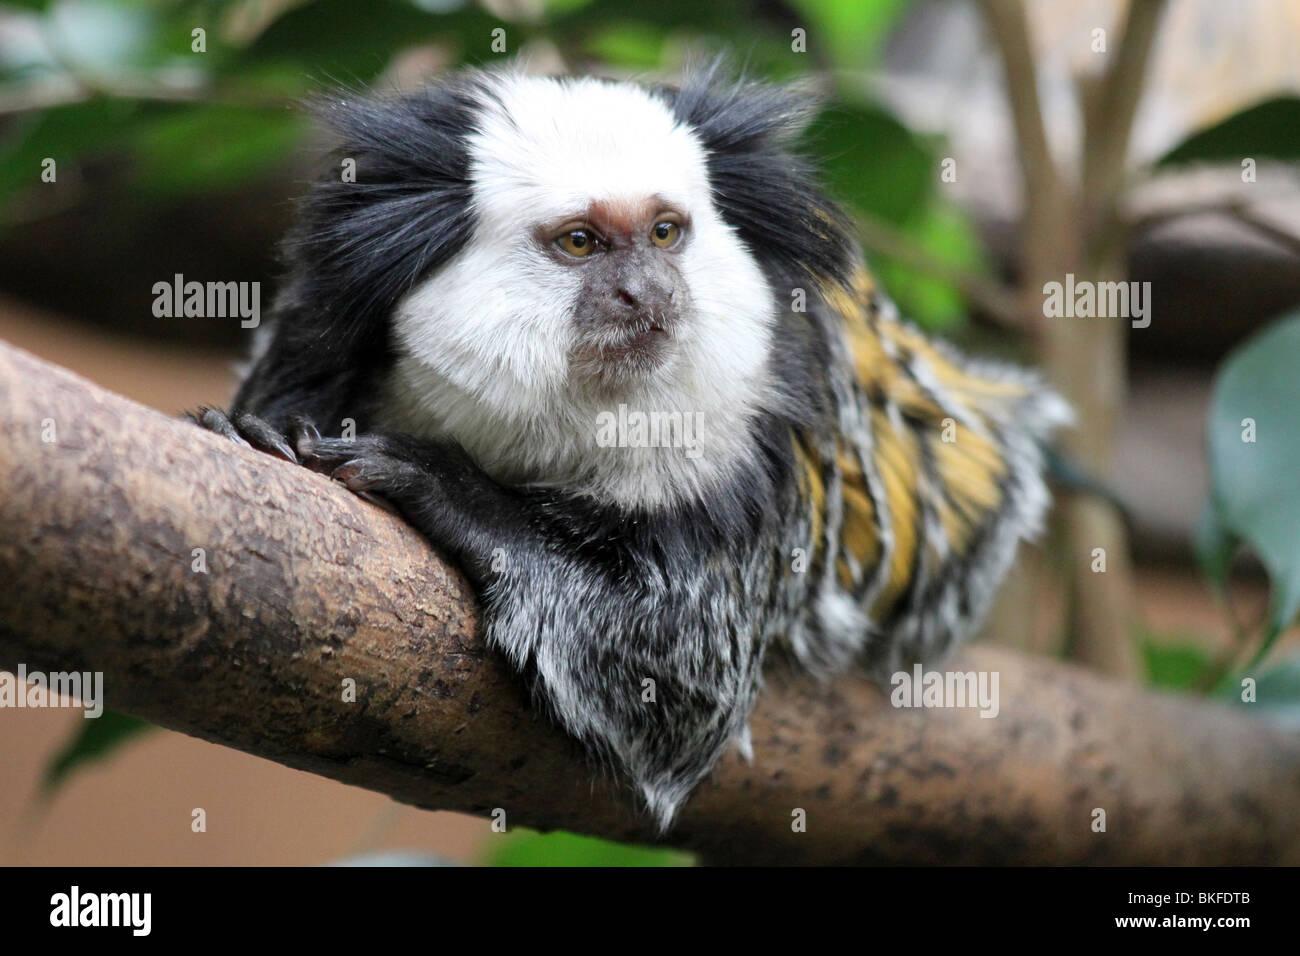 White-headed Marmoset Callithrix geoffroyi Taken at Chester Zoo, UK - Stock Image